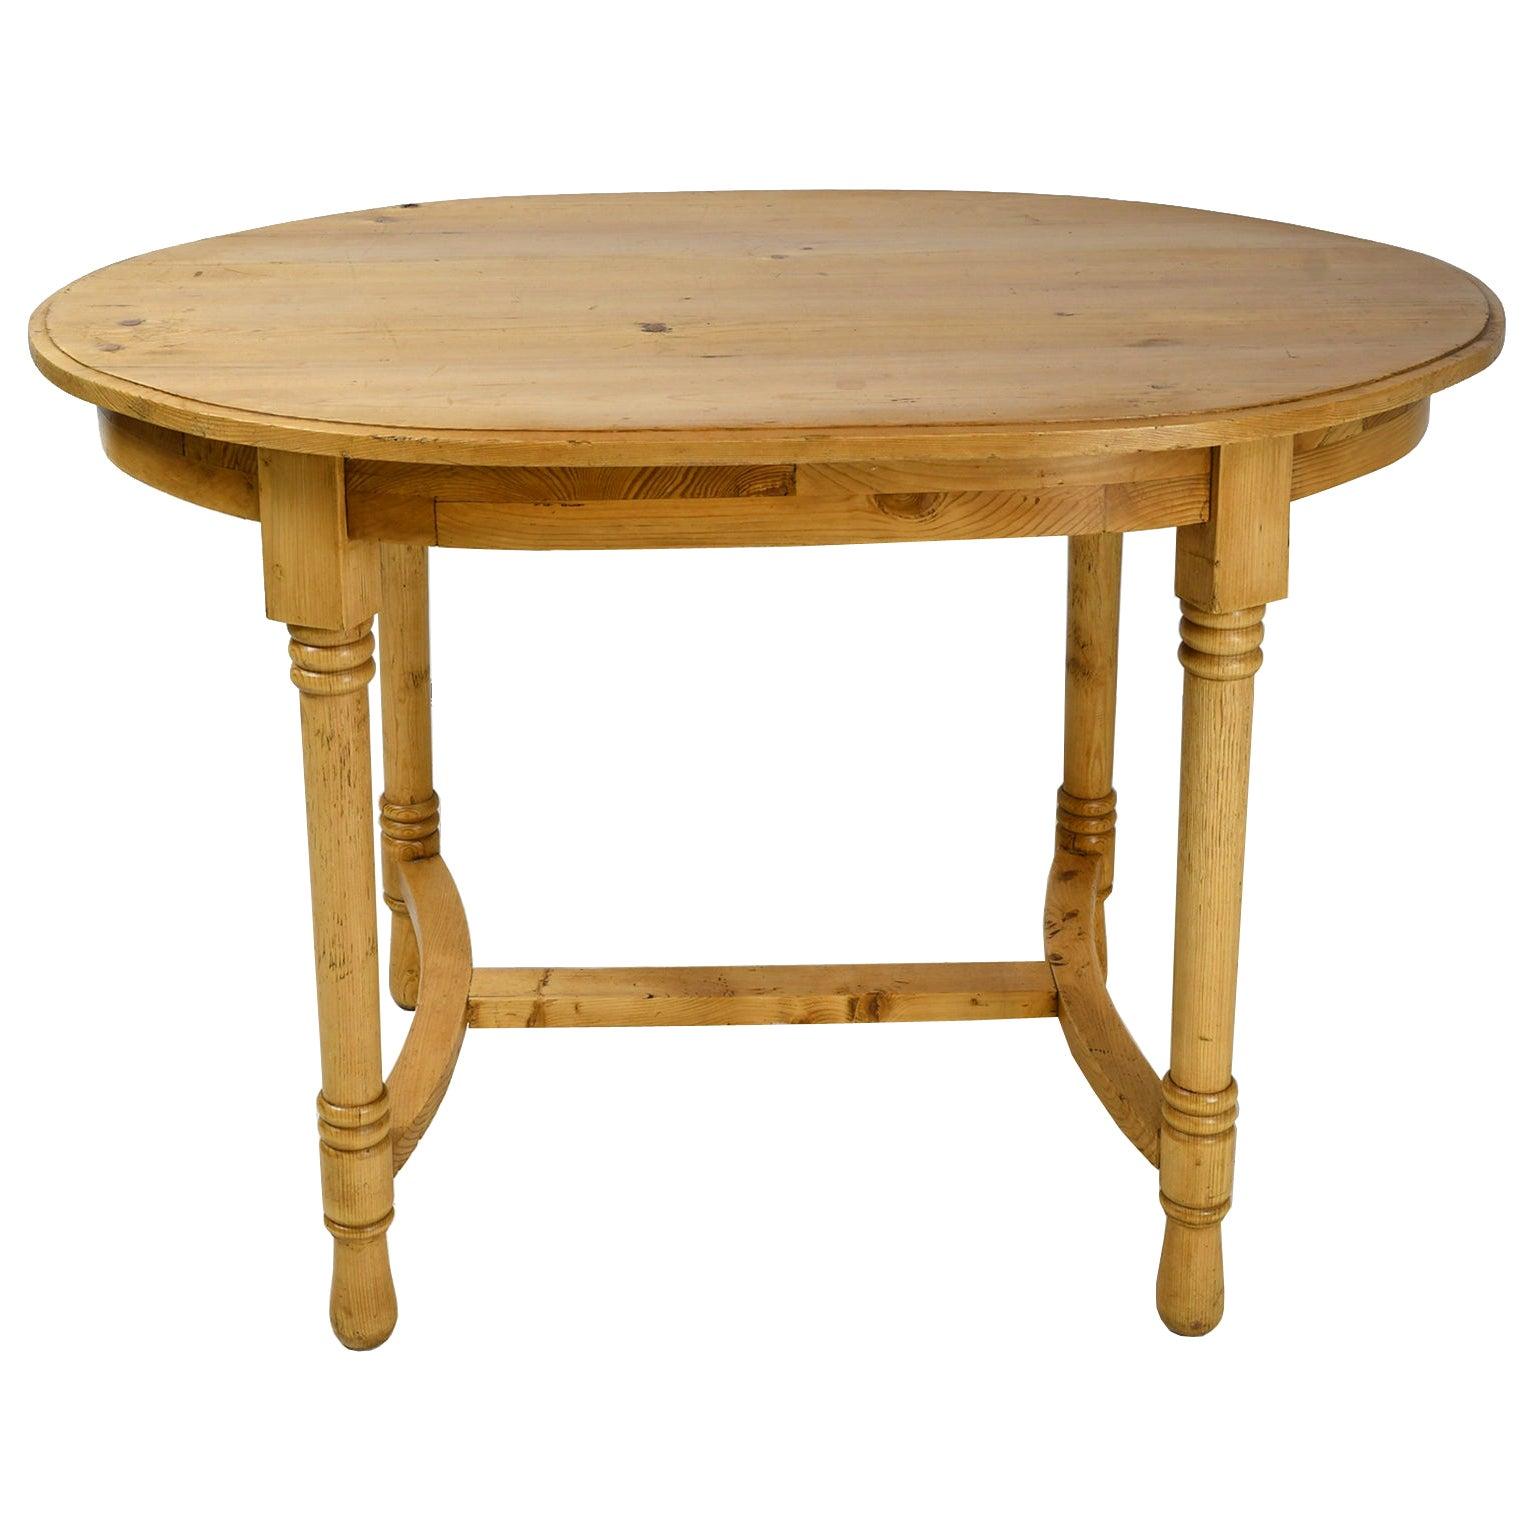 Antique European Oval Table in Pine, Danish or German, circa 1900